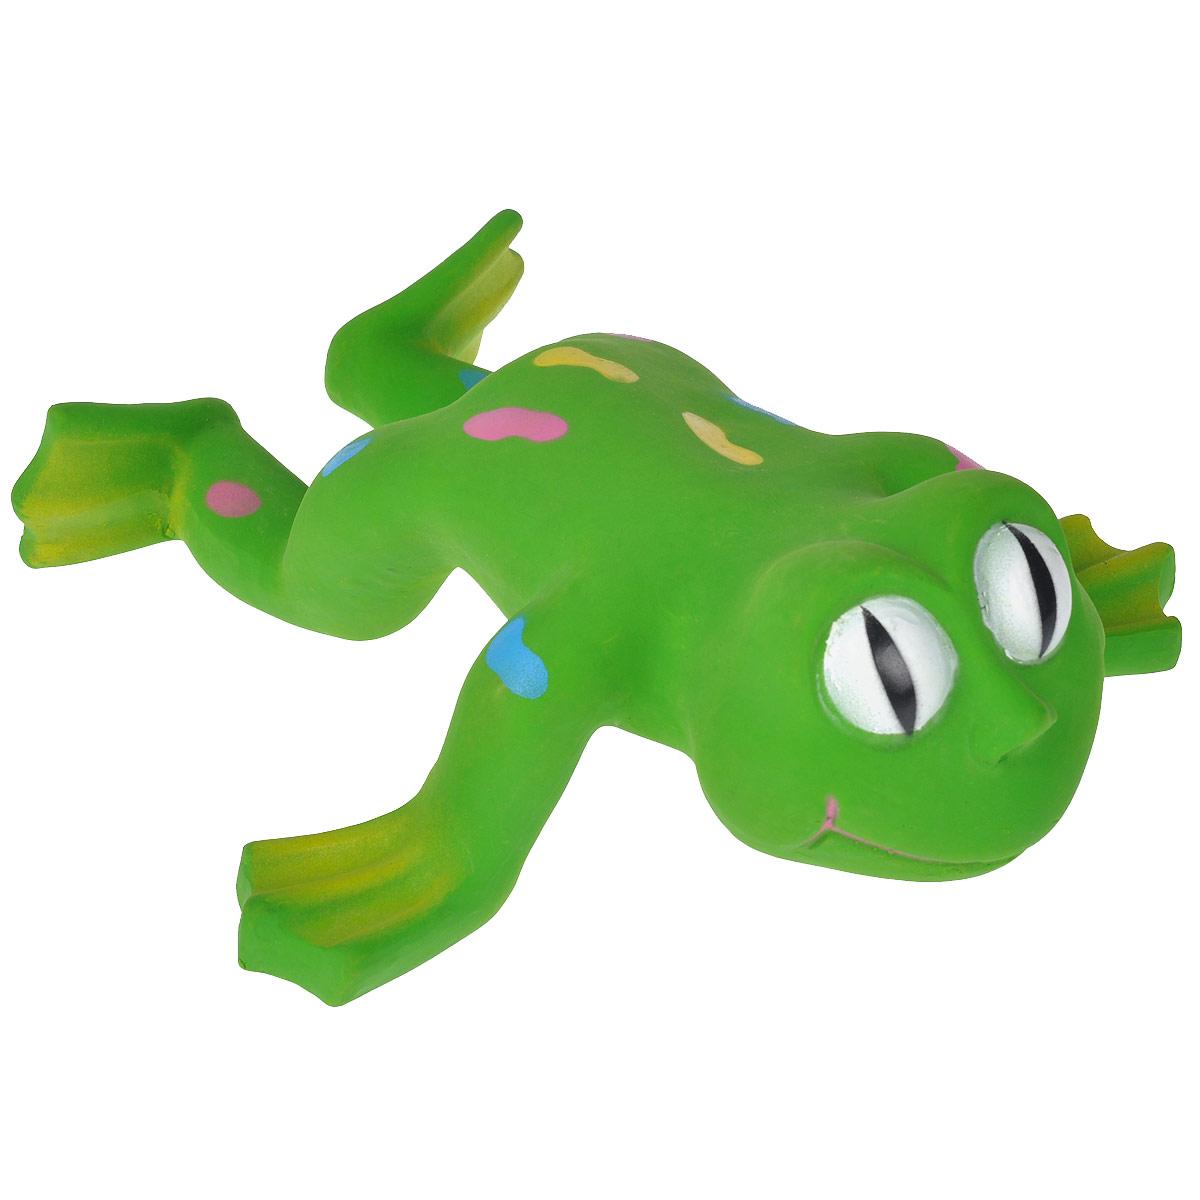 "Игрушка для собак I.P.T.S. ""Лягушка"""